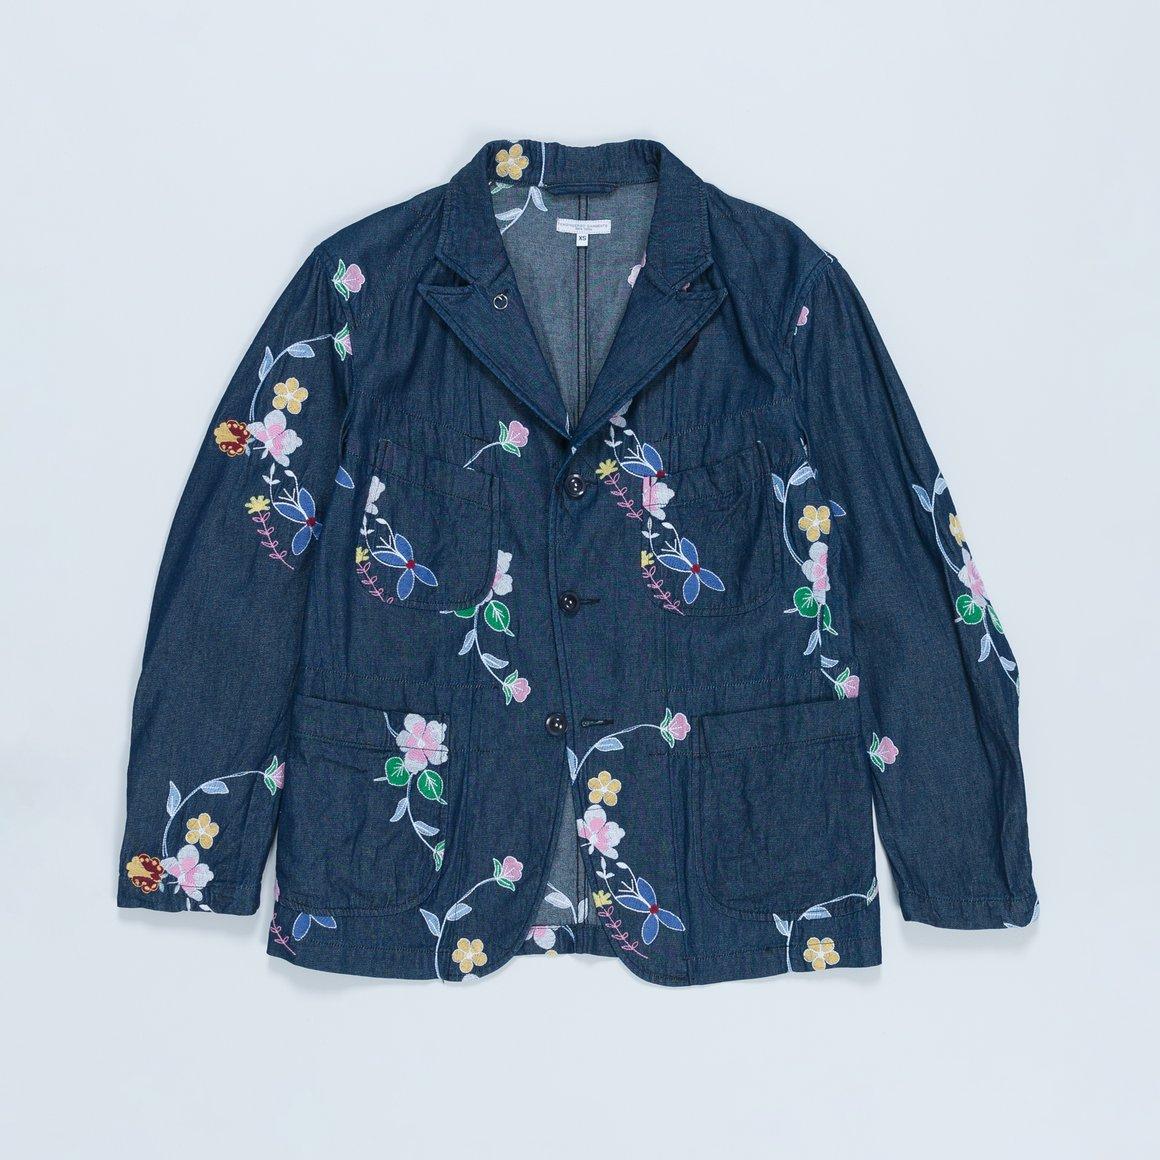 1593081410881engineered-garments-bedford-jacket-indigo-denim-floral-embroidery-1_1160x.jpg